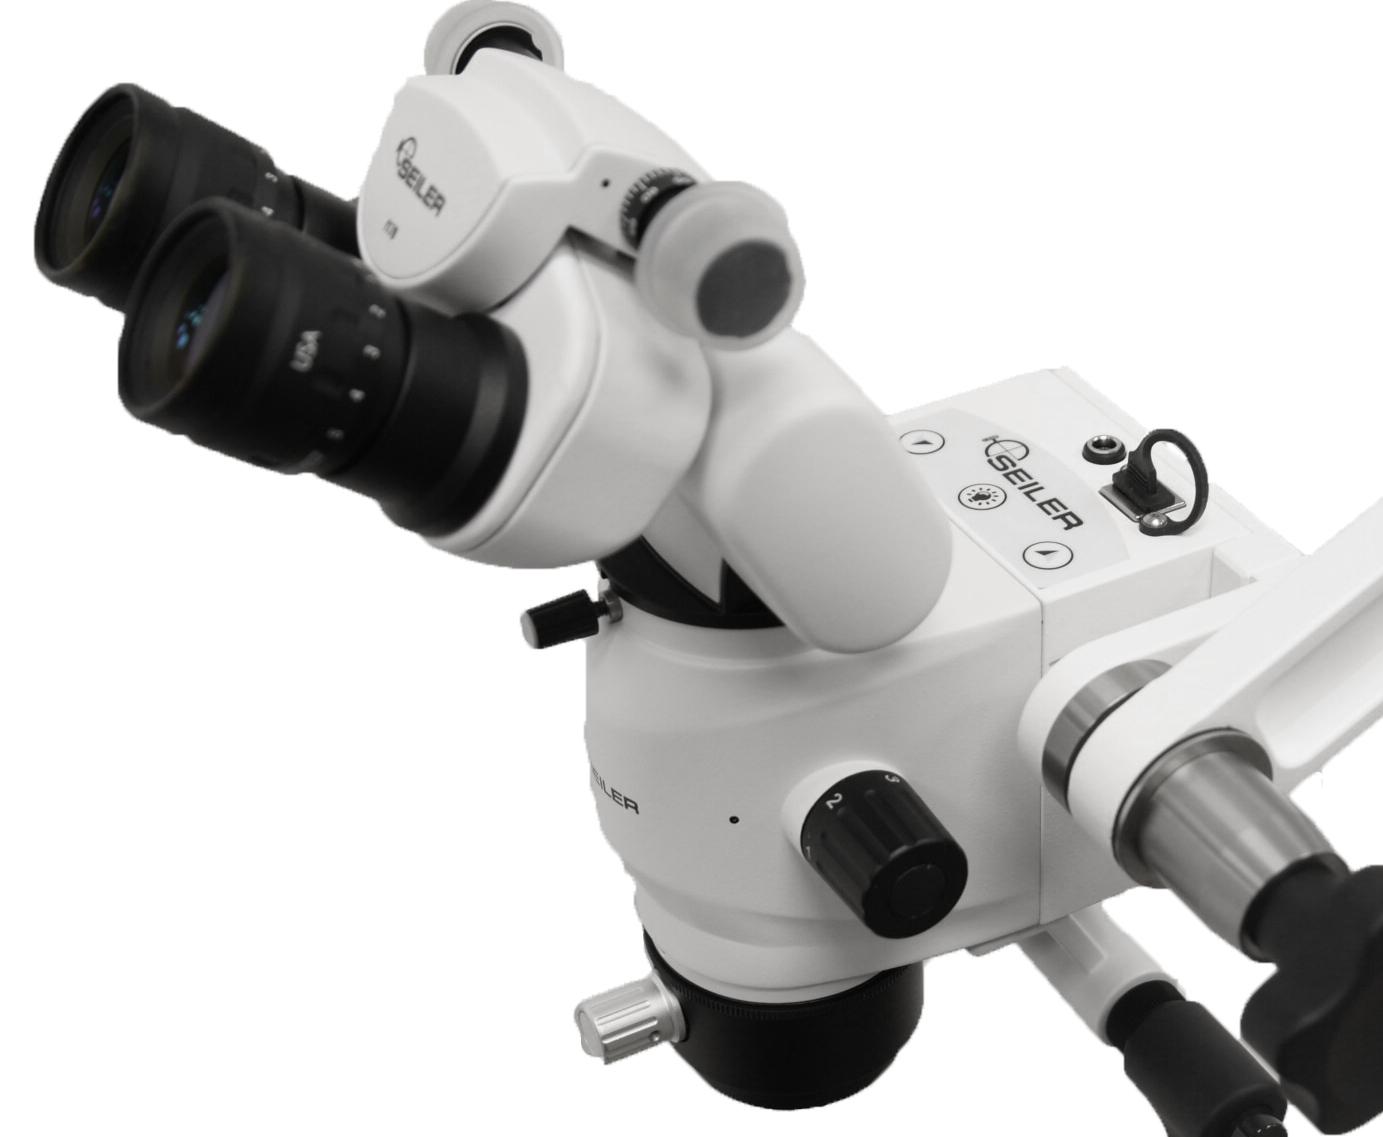 close up of optic pod controls